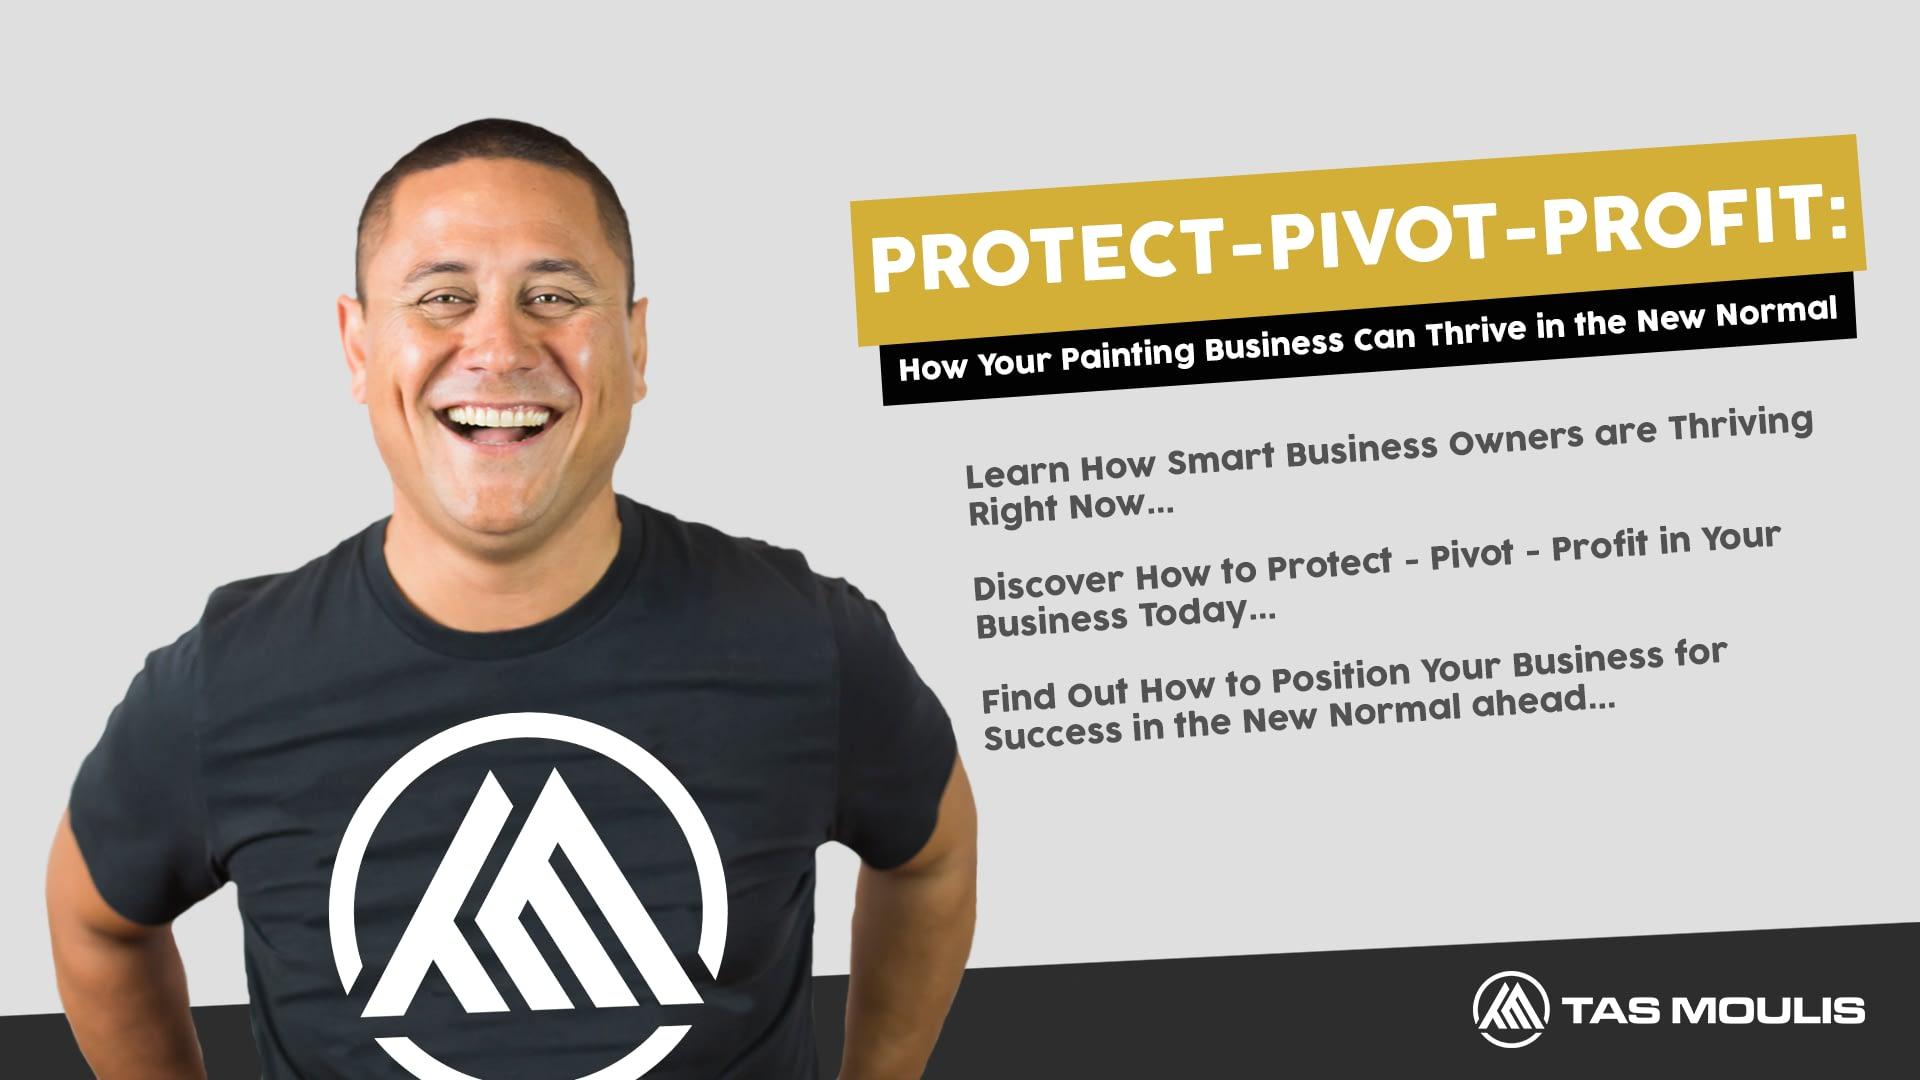 protect-pivot-profit-banner